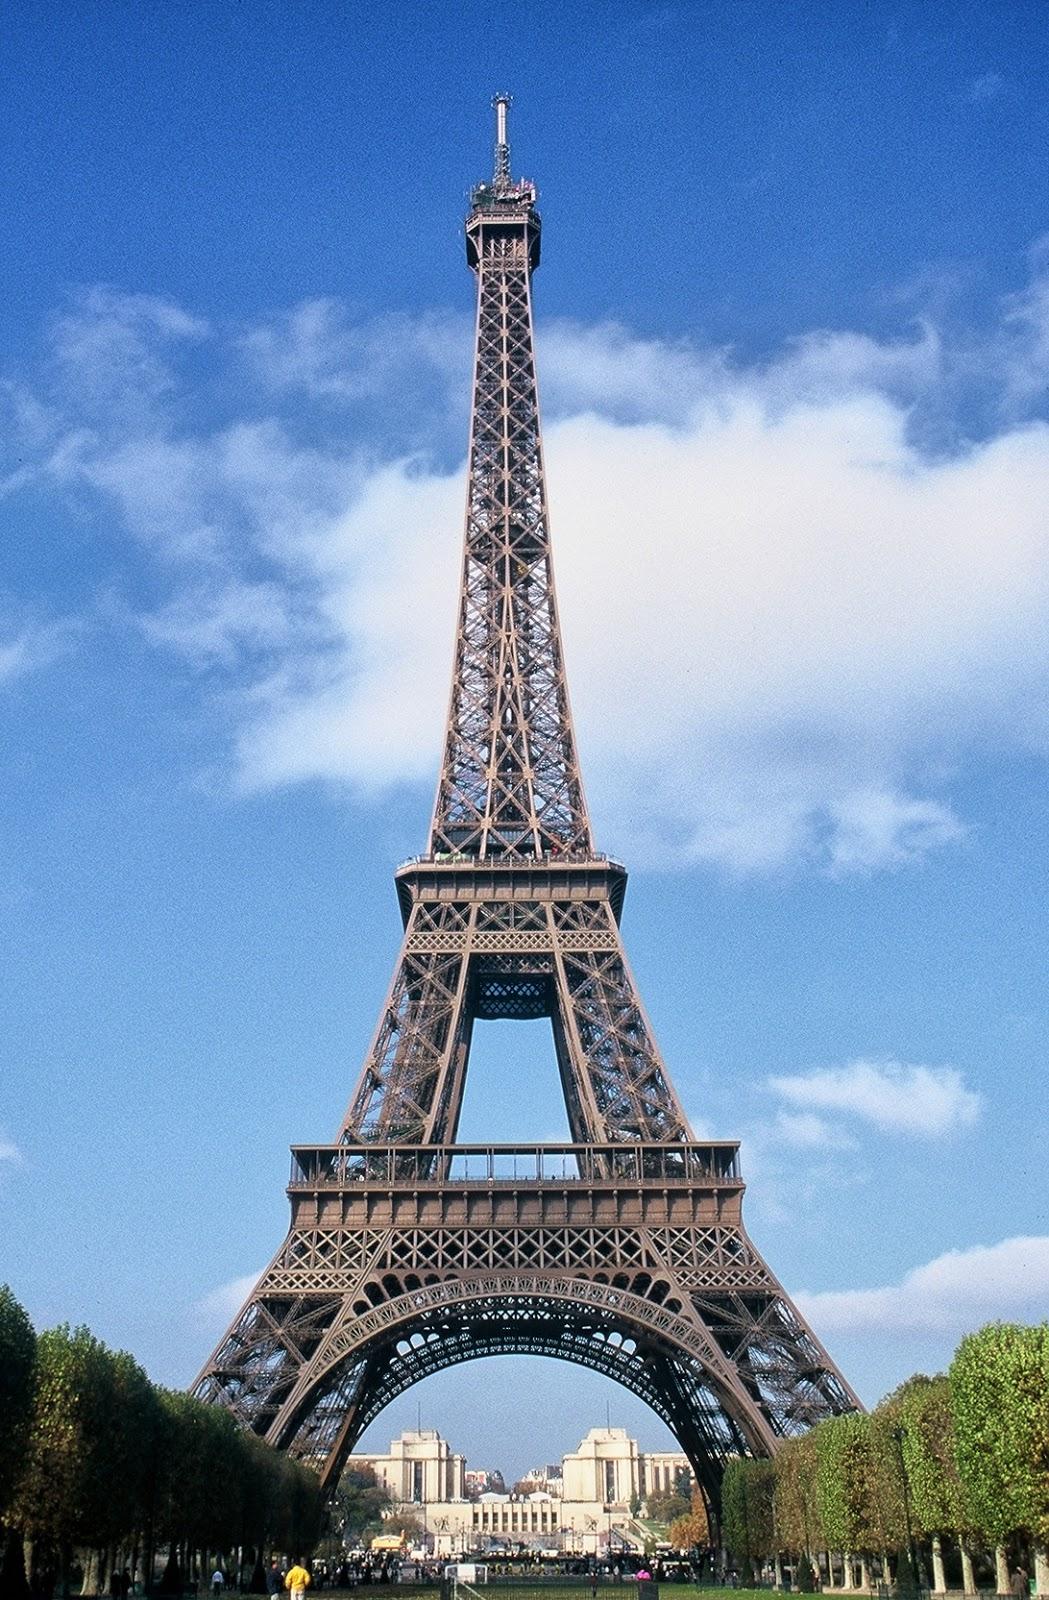 Who Designed The Eiffel Tower World Visits Tours The Eiffel Tower Famous Symbol Paris